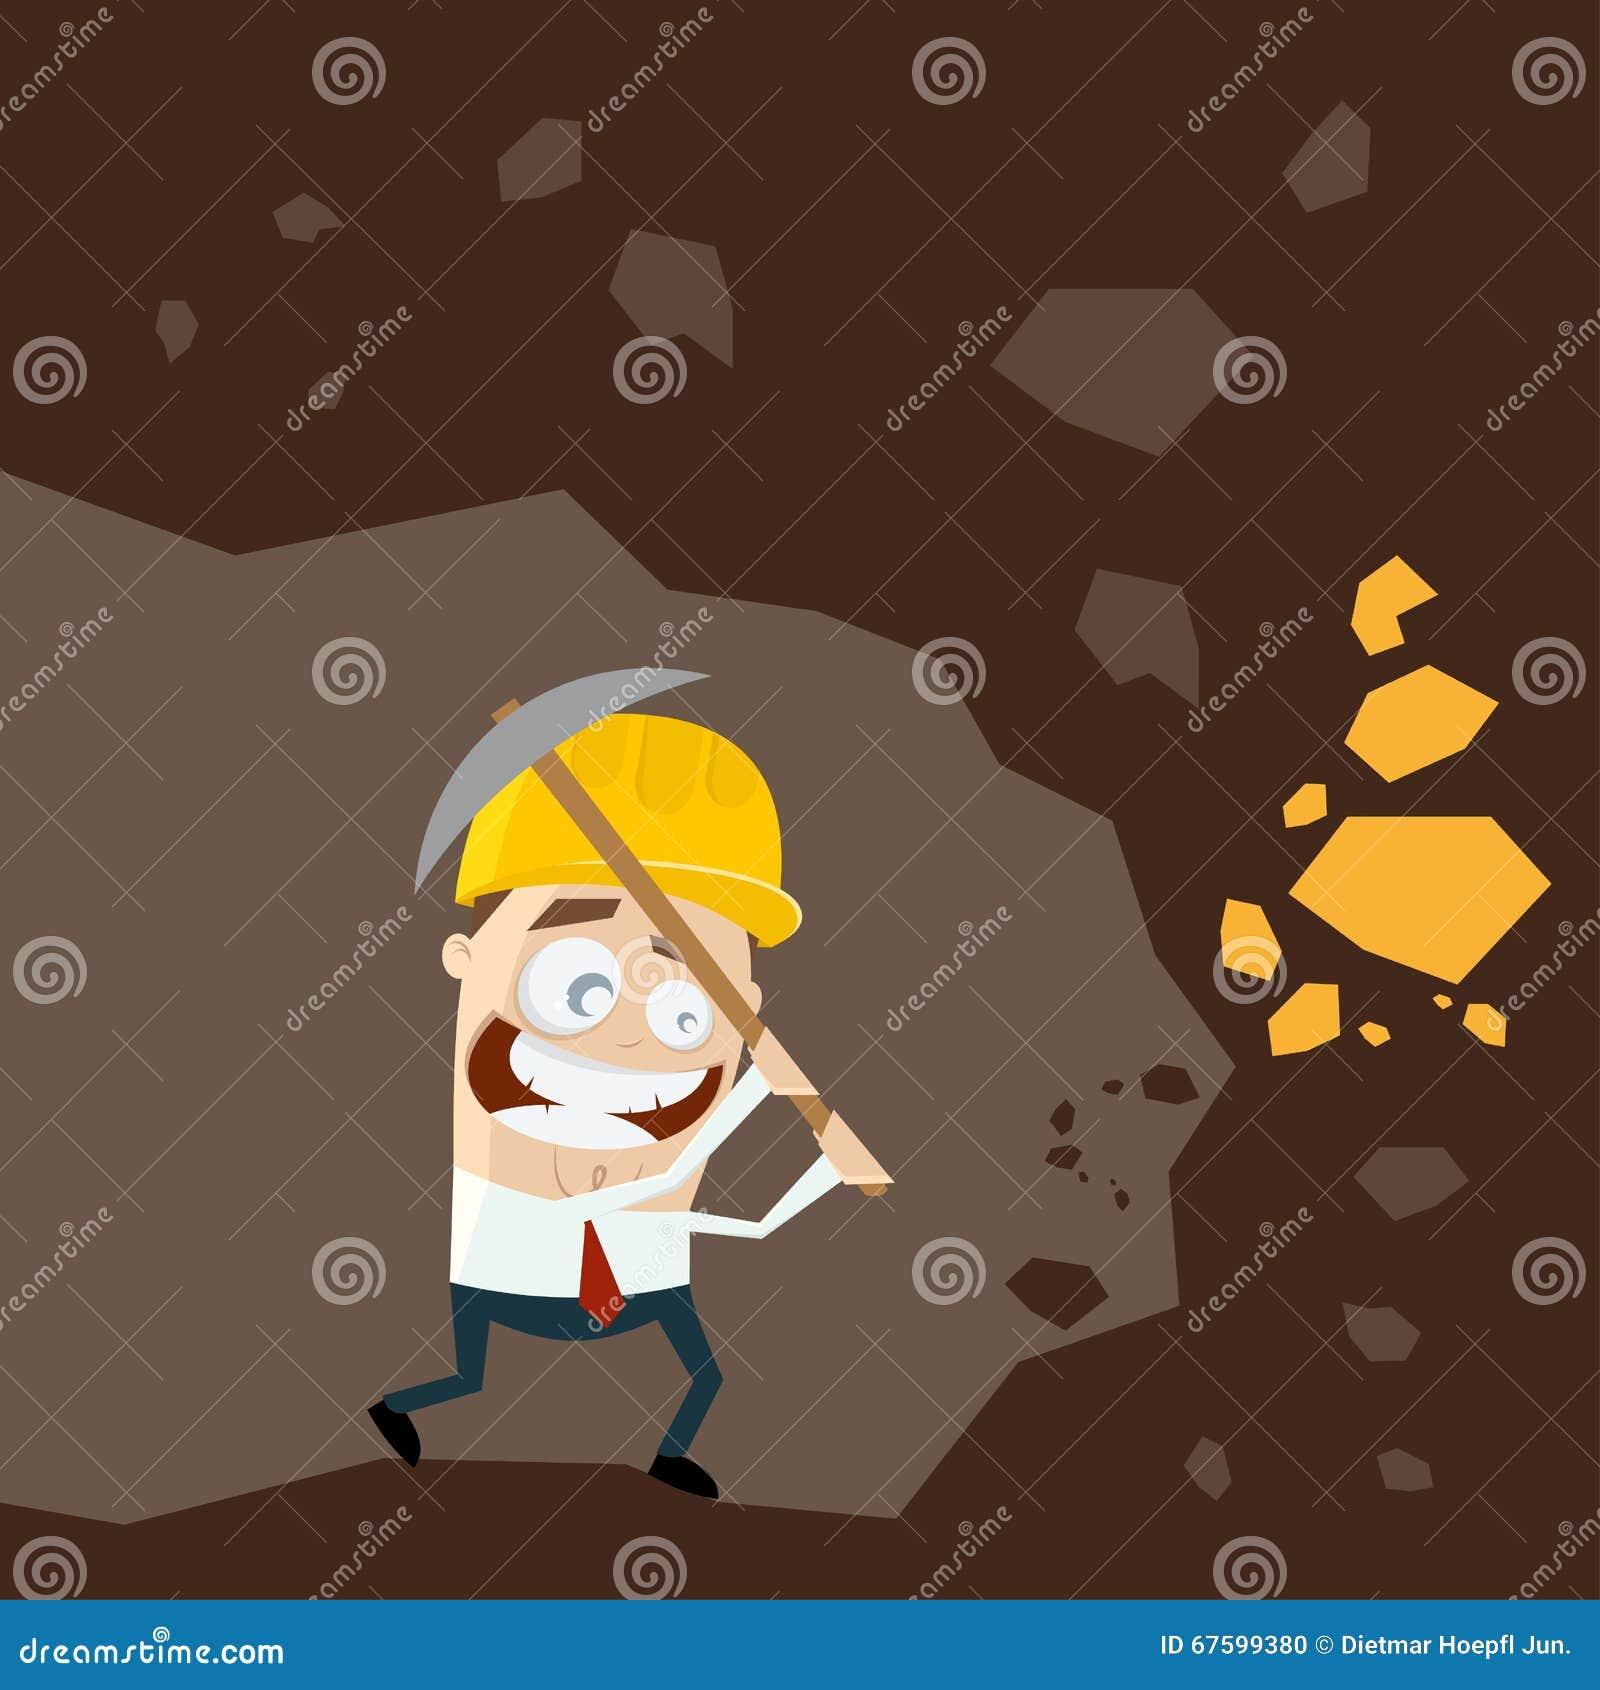 Funny Cartoon Gold Digger Stock Vector Image 67599380